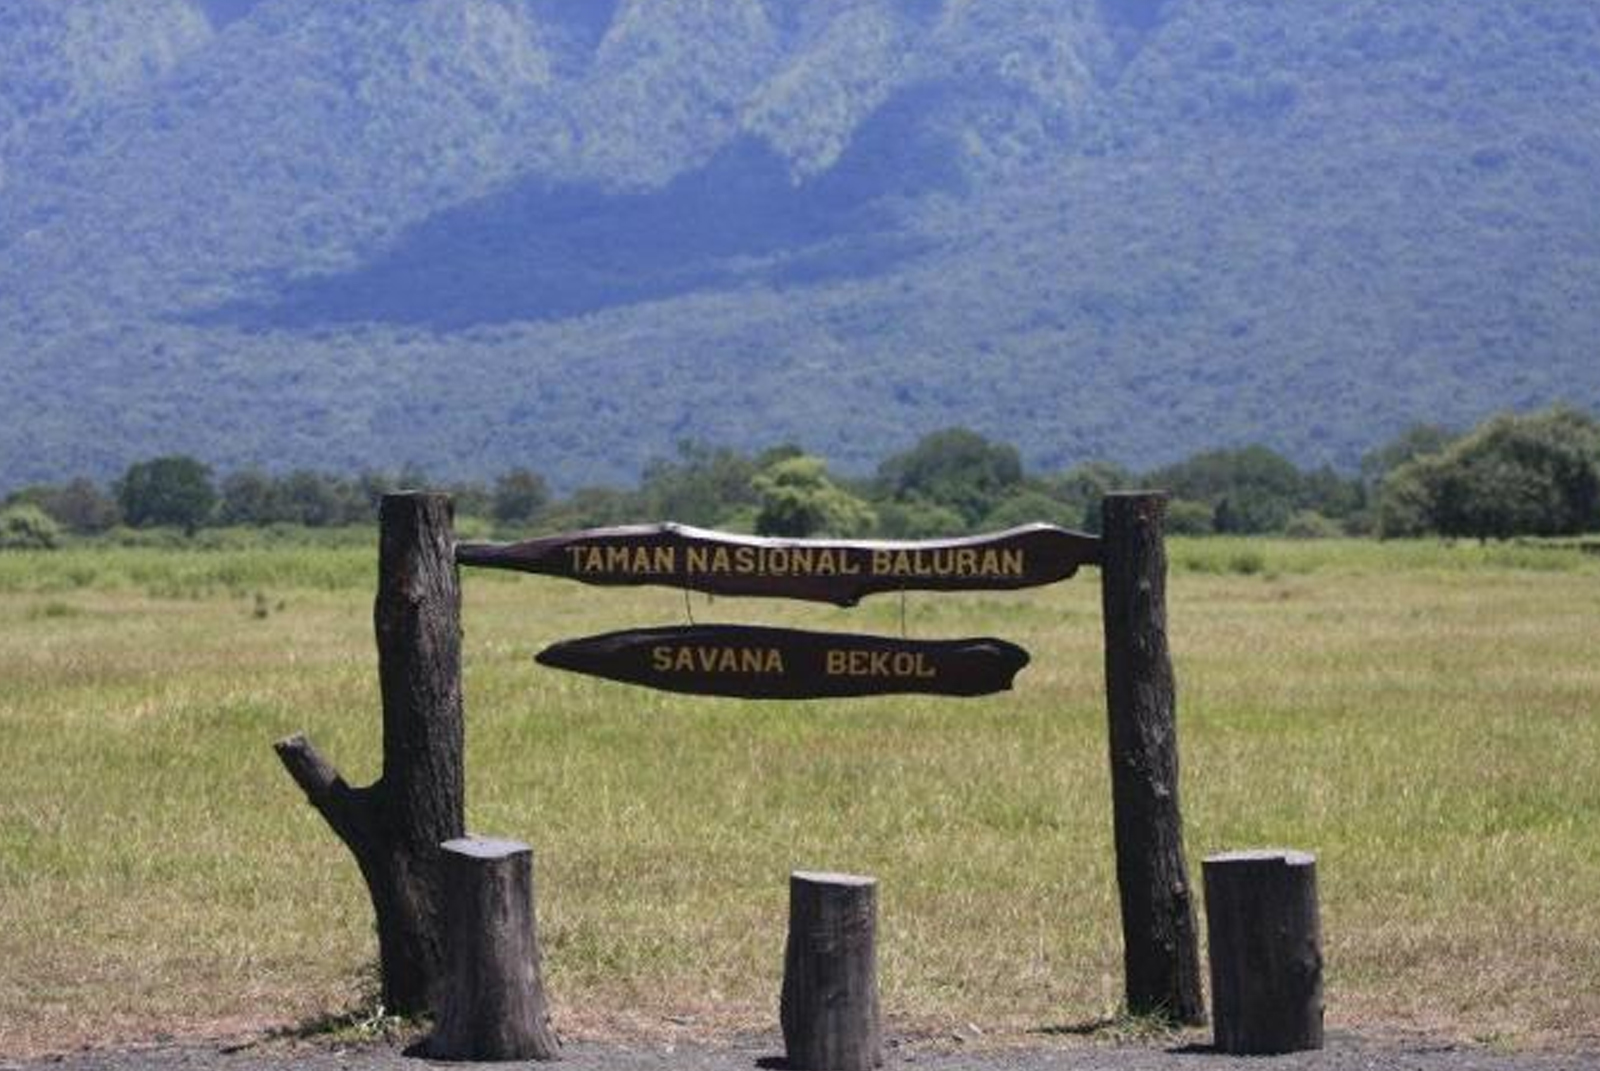 Savana Bekol di Taman Nasional Bularan | onyjamhari/kompasiana.com